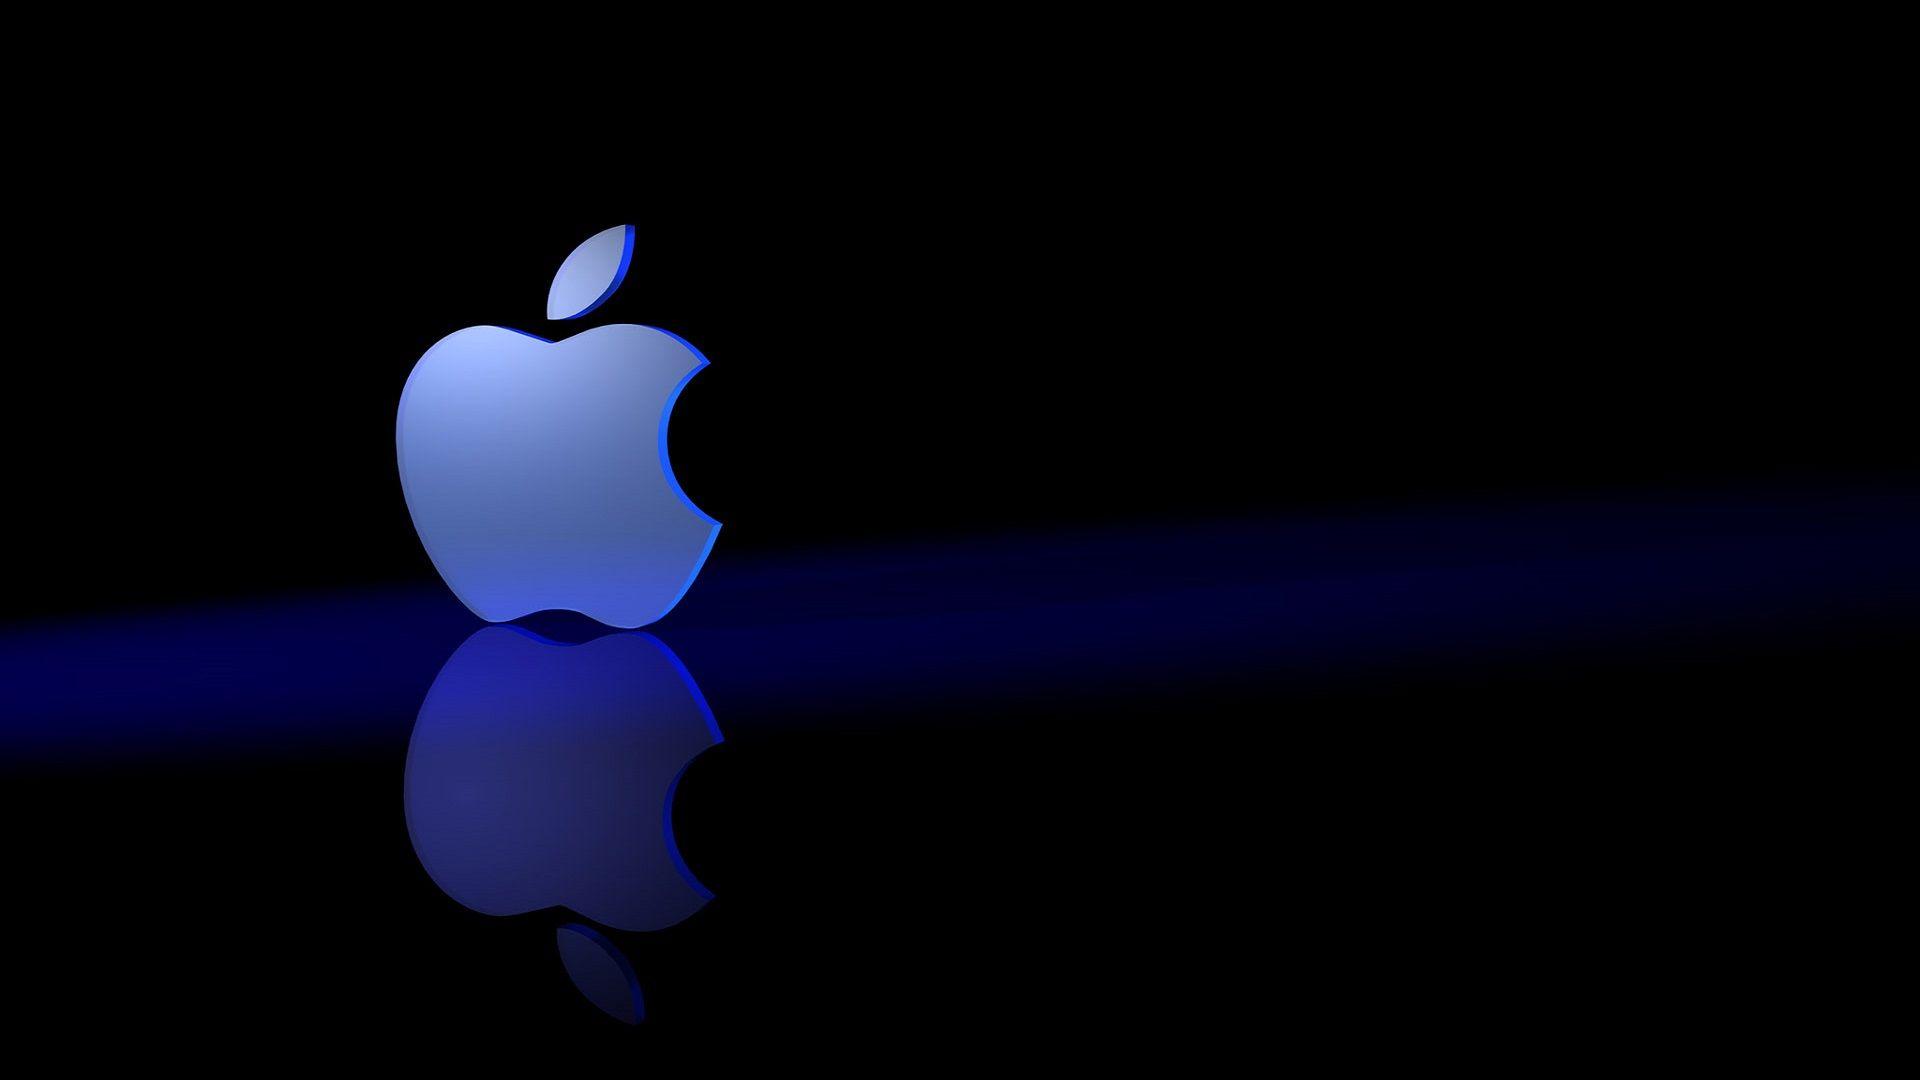 Nice Apple Logo Hd Wallpaper At Wallpapersmap Com Computer Wallpaper Hd Apple Wallpaper Apple Logo Wallpaper